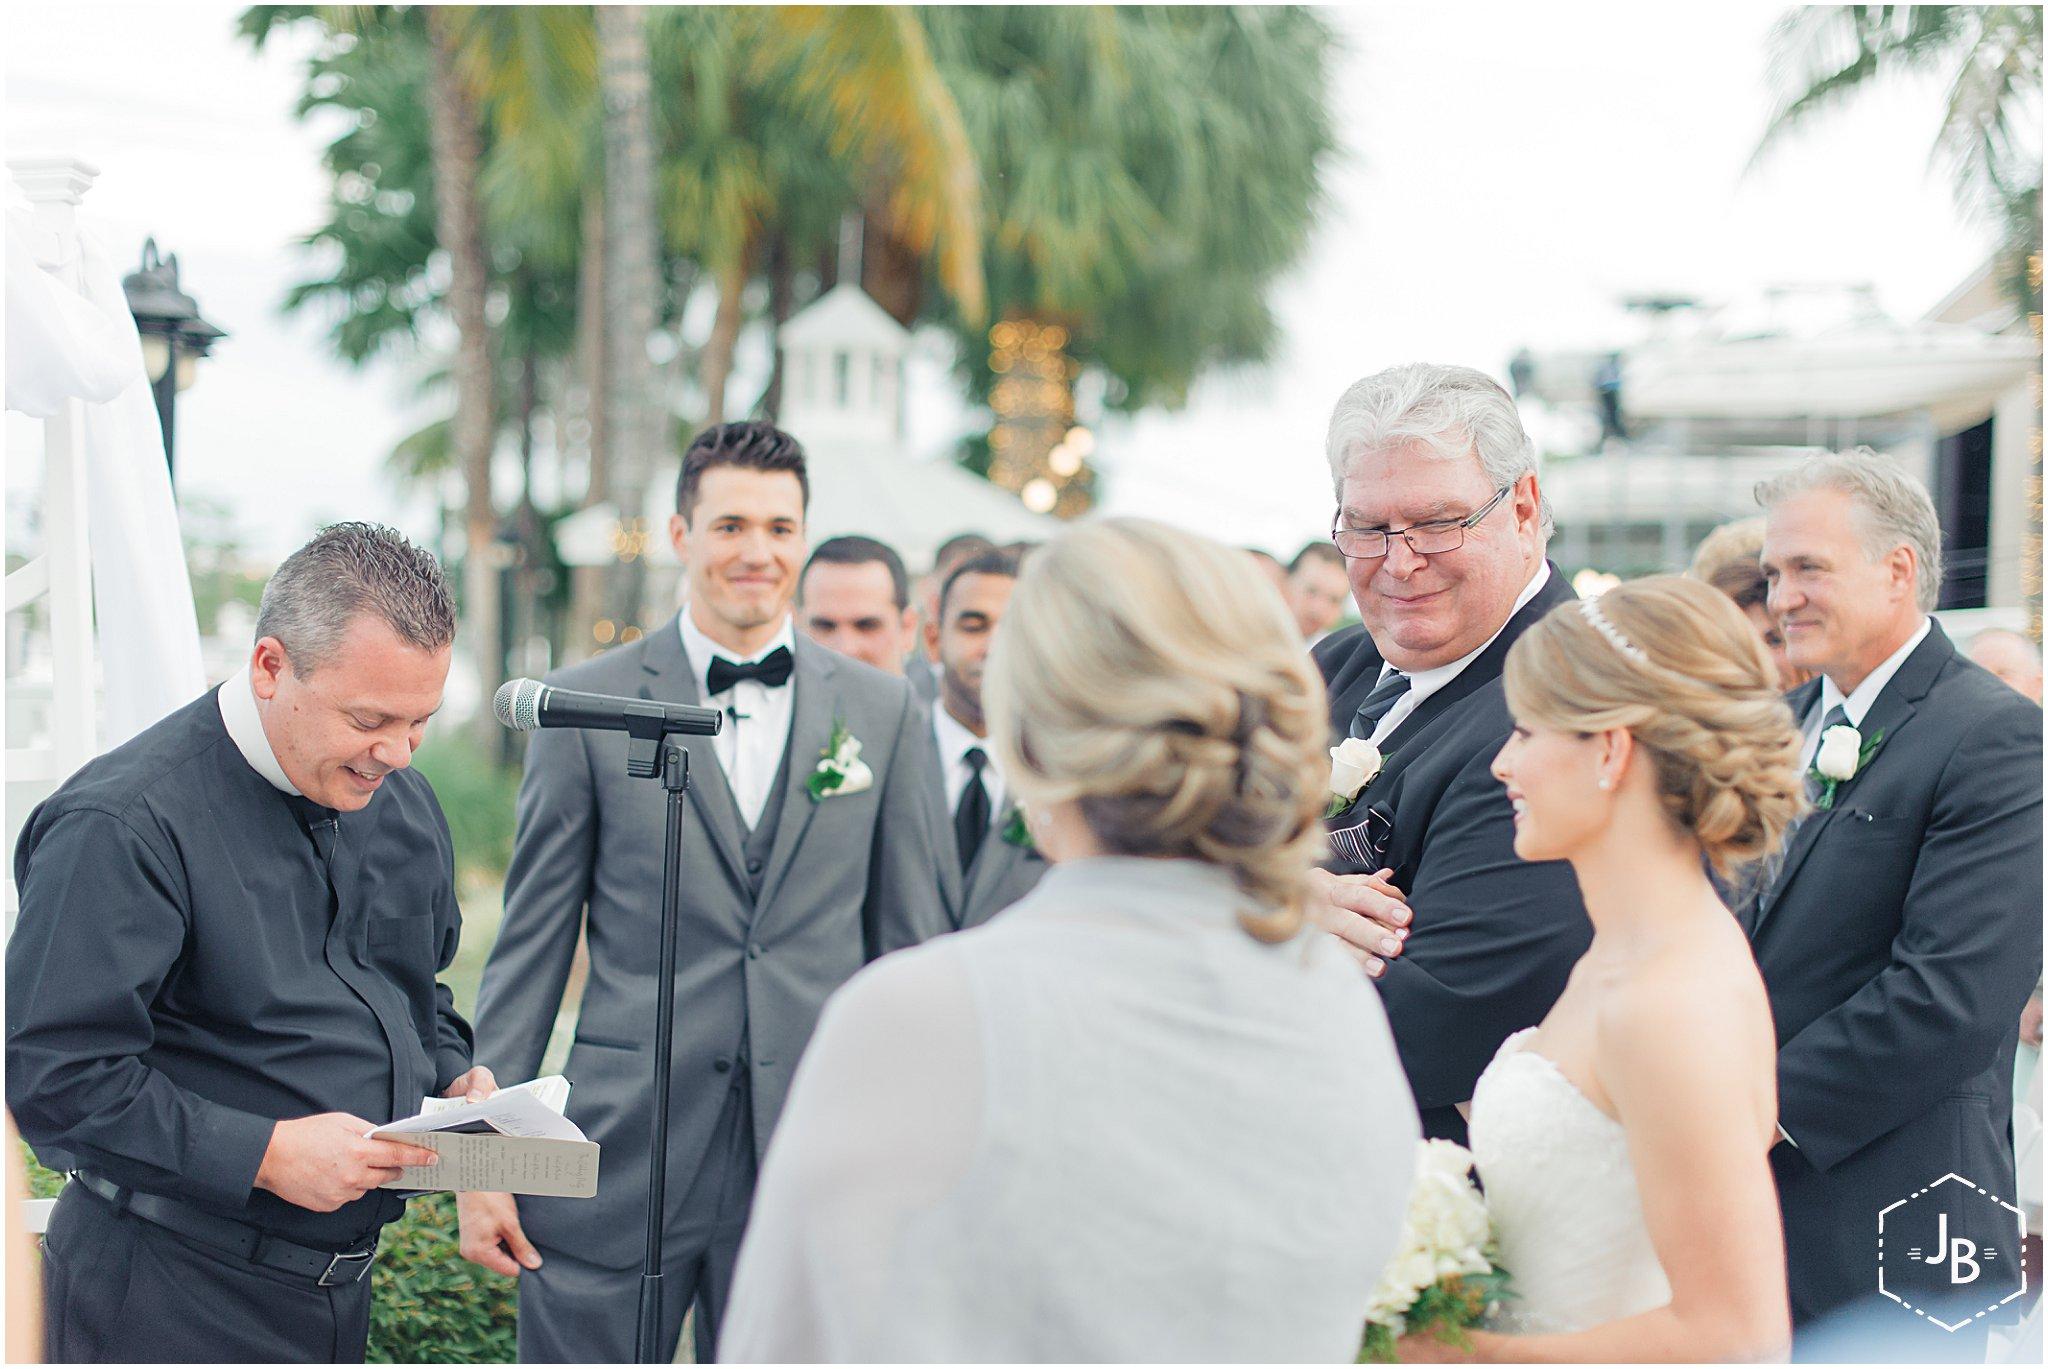 WeddingandEngagementFloridaPhotographer_0353.jpg